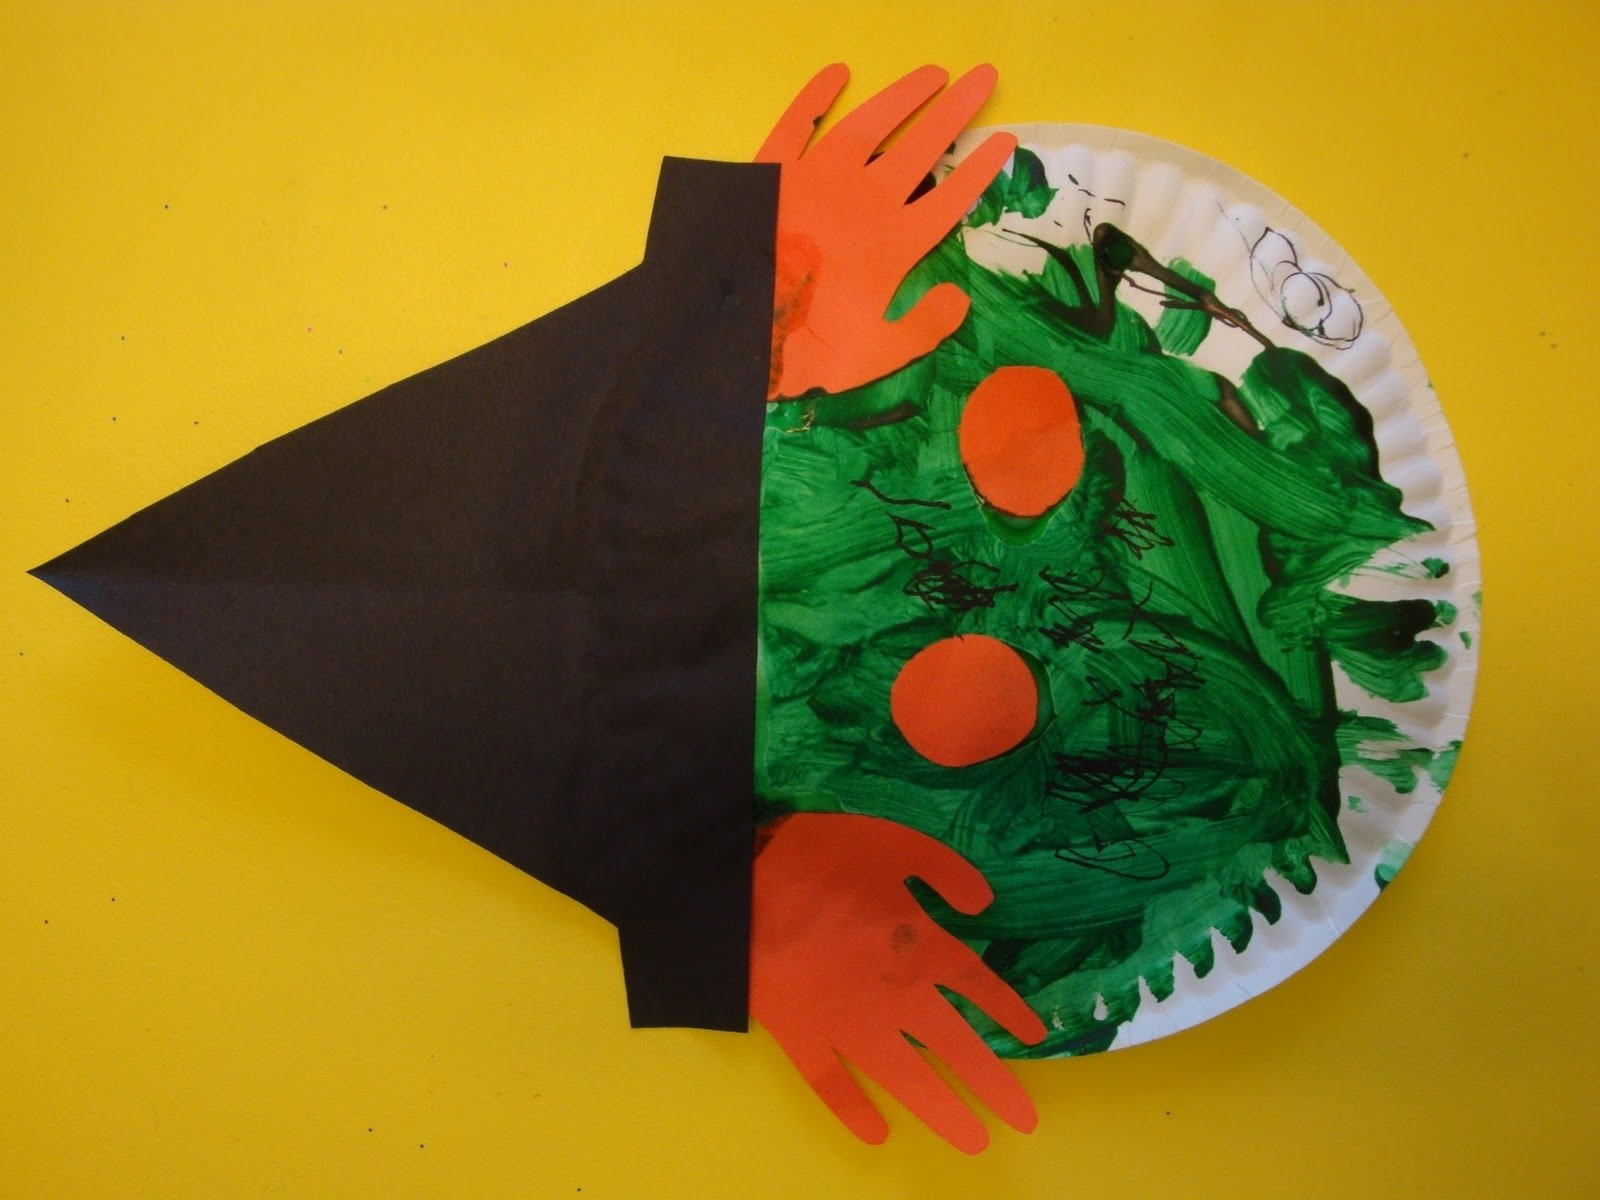 10 Elegant Halloween Craft Ideas For Preschoolers five little pumpkins art projects niccis little angels arts 2021